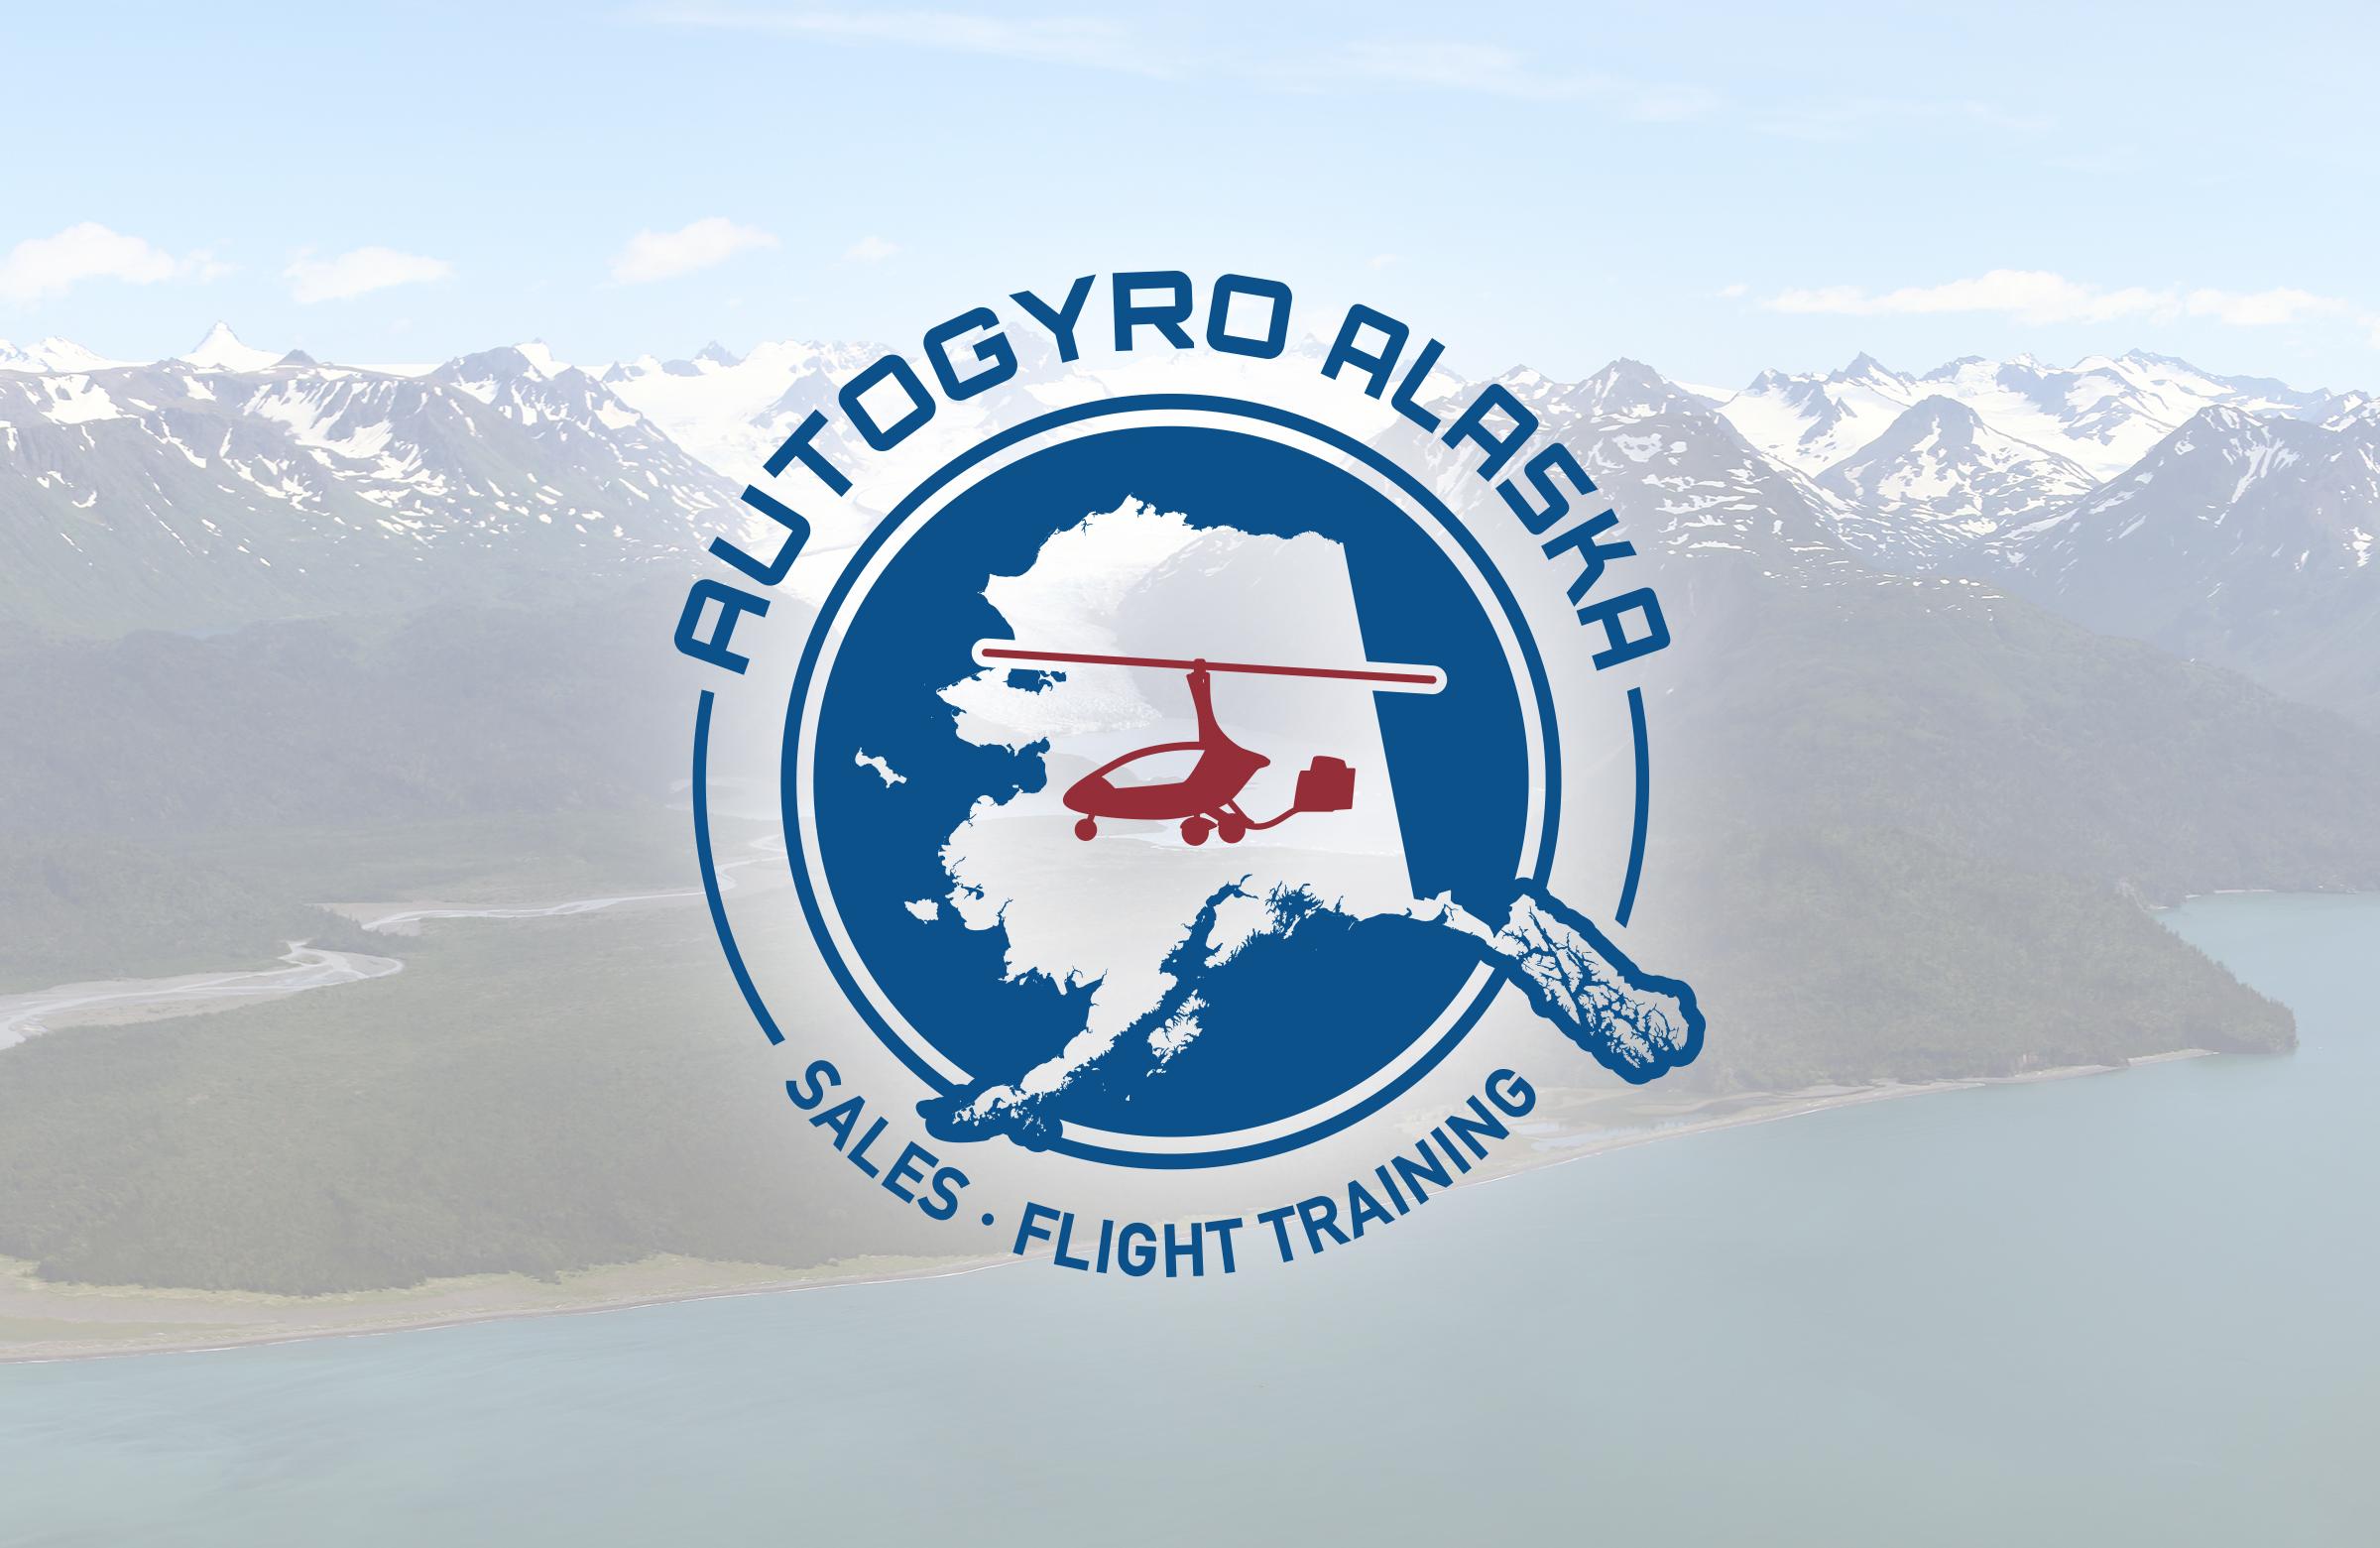 Autogyro_logo.jpg